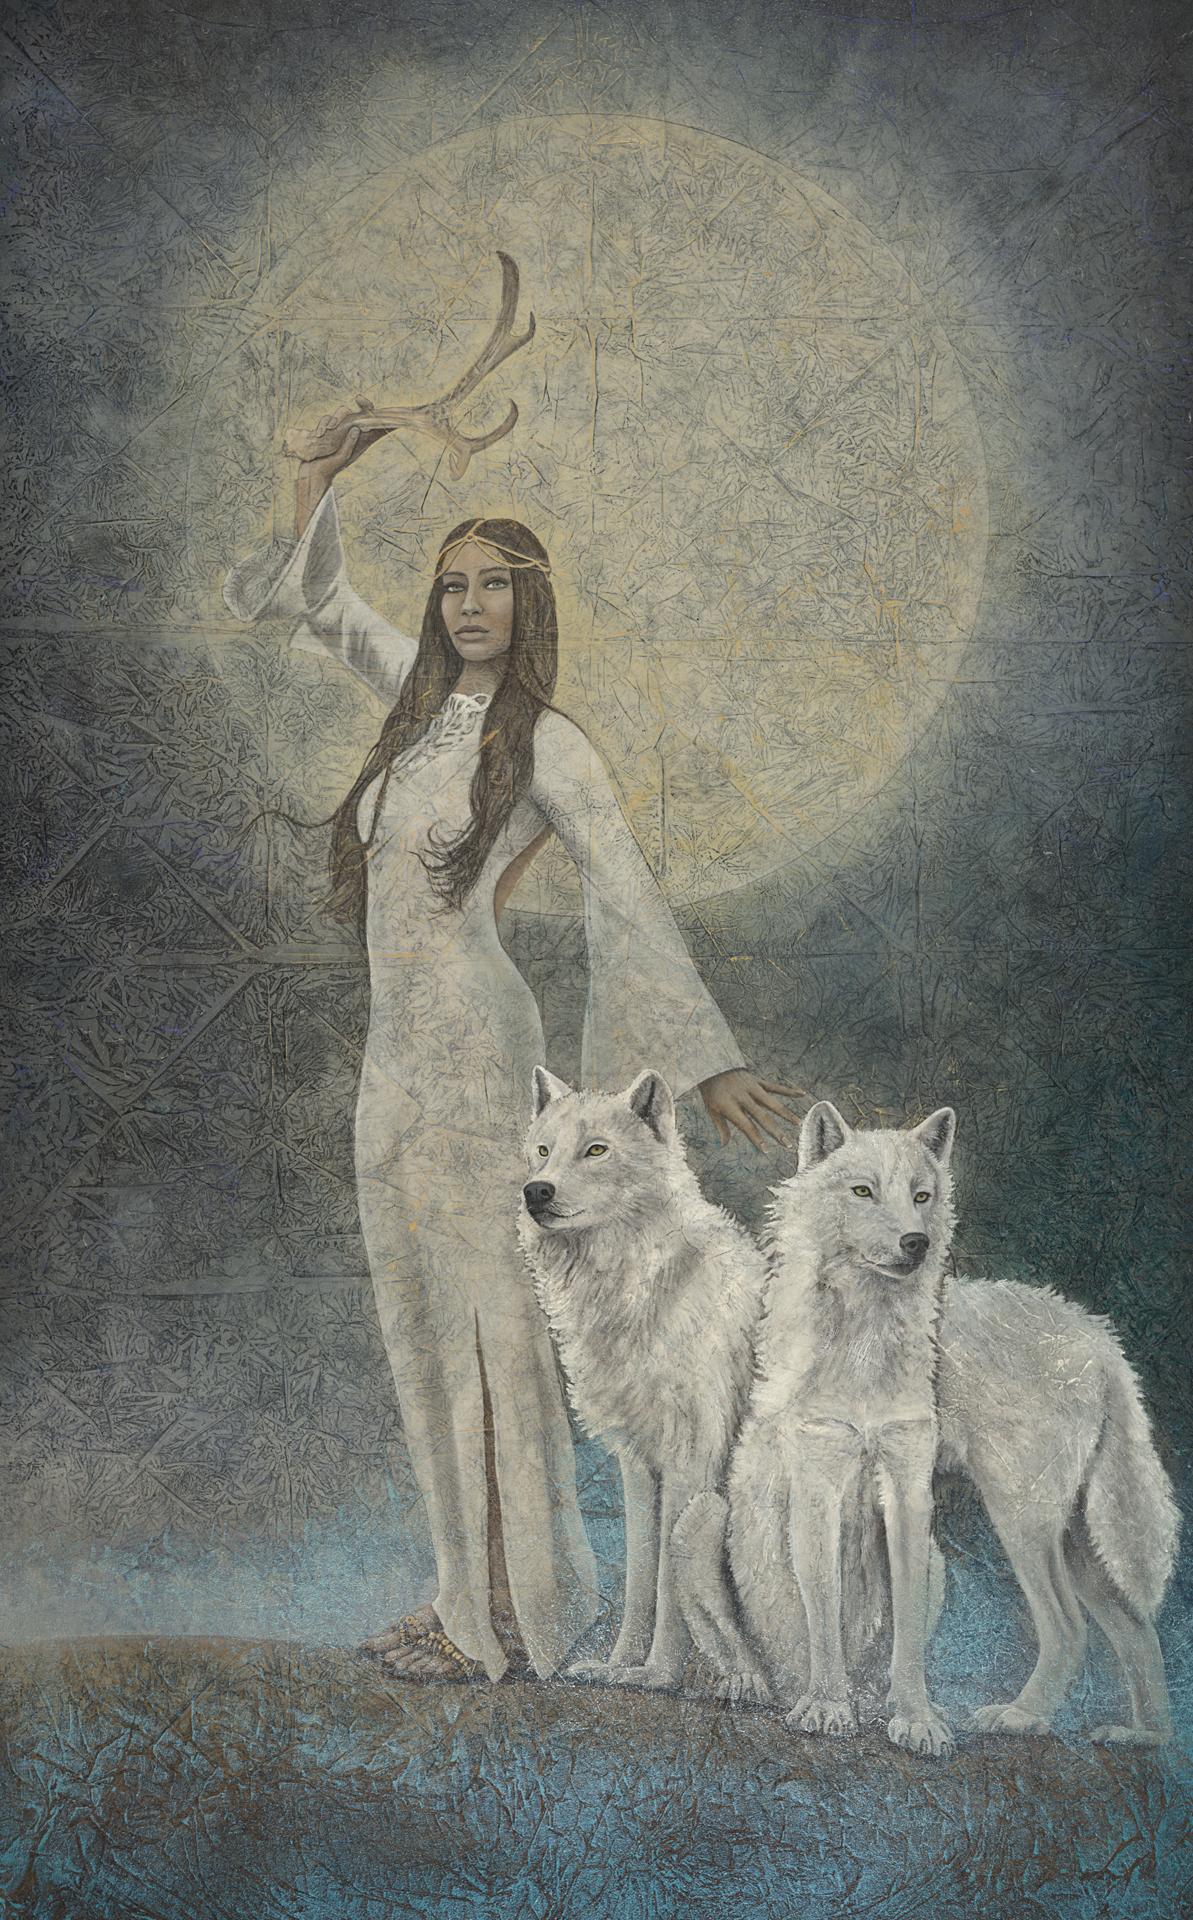 Summoning Powers_Evolutionary Art_Kimberly-Webber_Contemporary Symbolist Paintings_Magical Realism_Transcendental Art_Archetypal Visionary Artist_Taos New Mexico